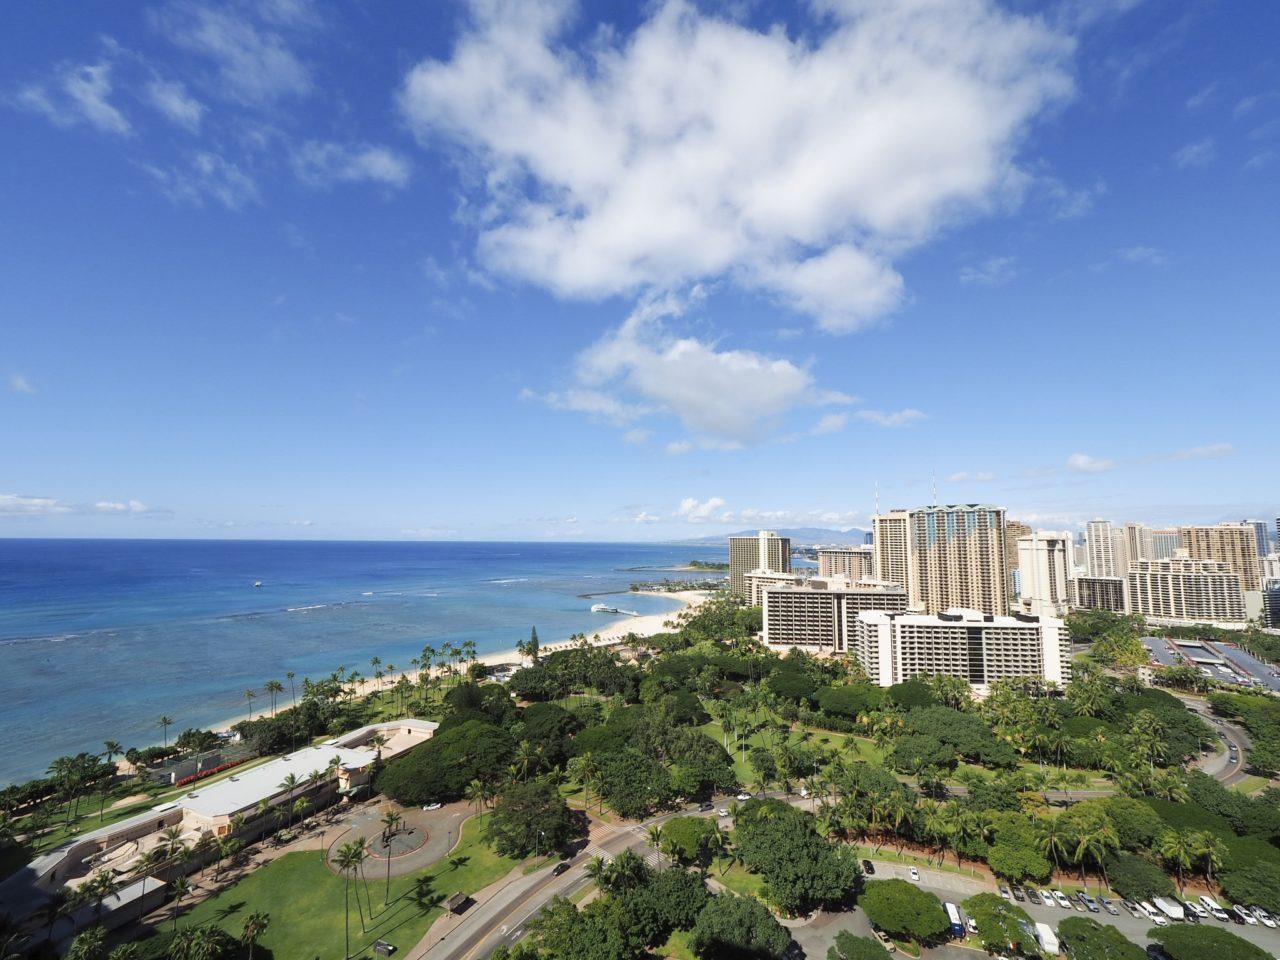 img 4900 - Trump International Hotel Waikiki - ファミリーステイに大満足!トランプ インターナショナル ホテルステイ